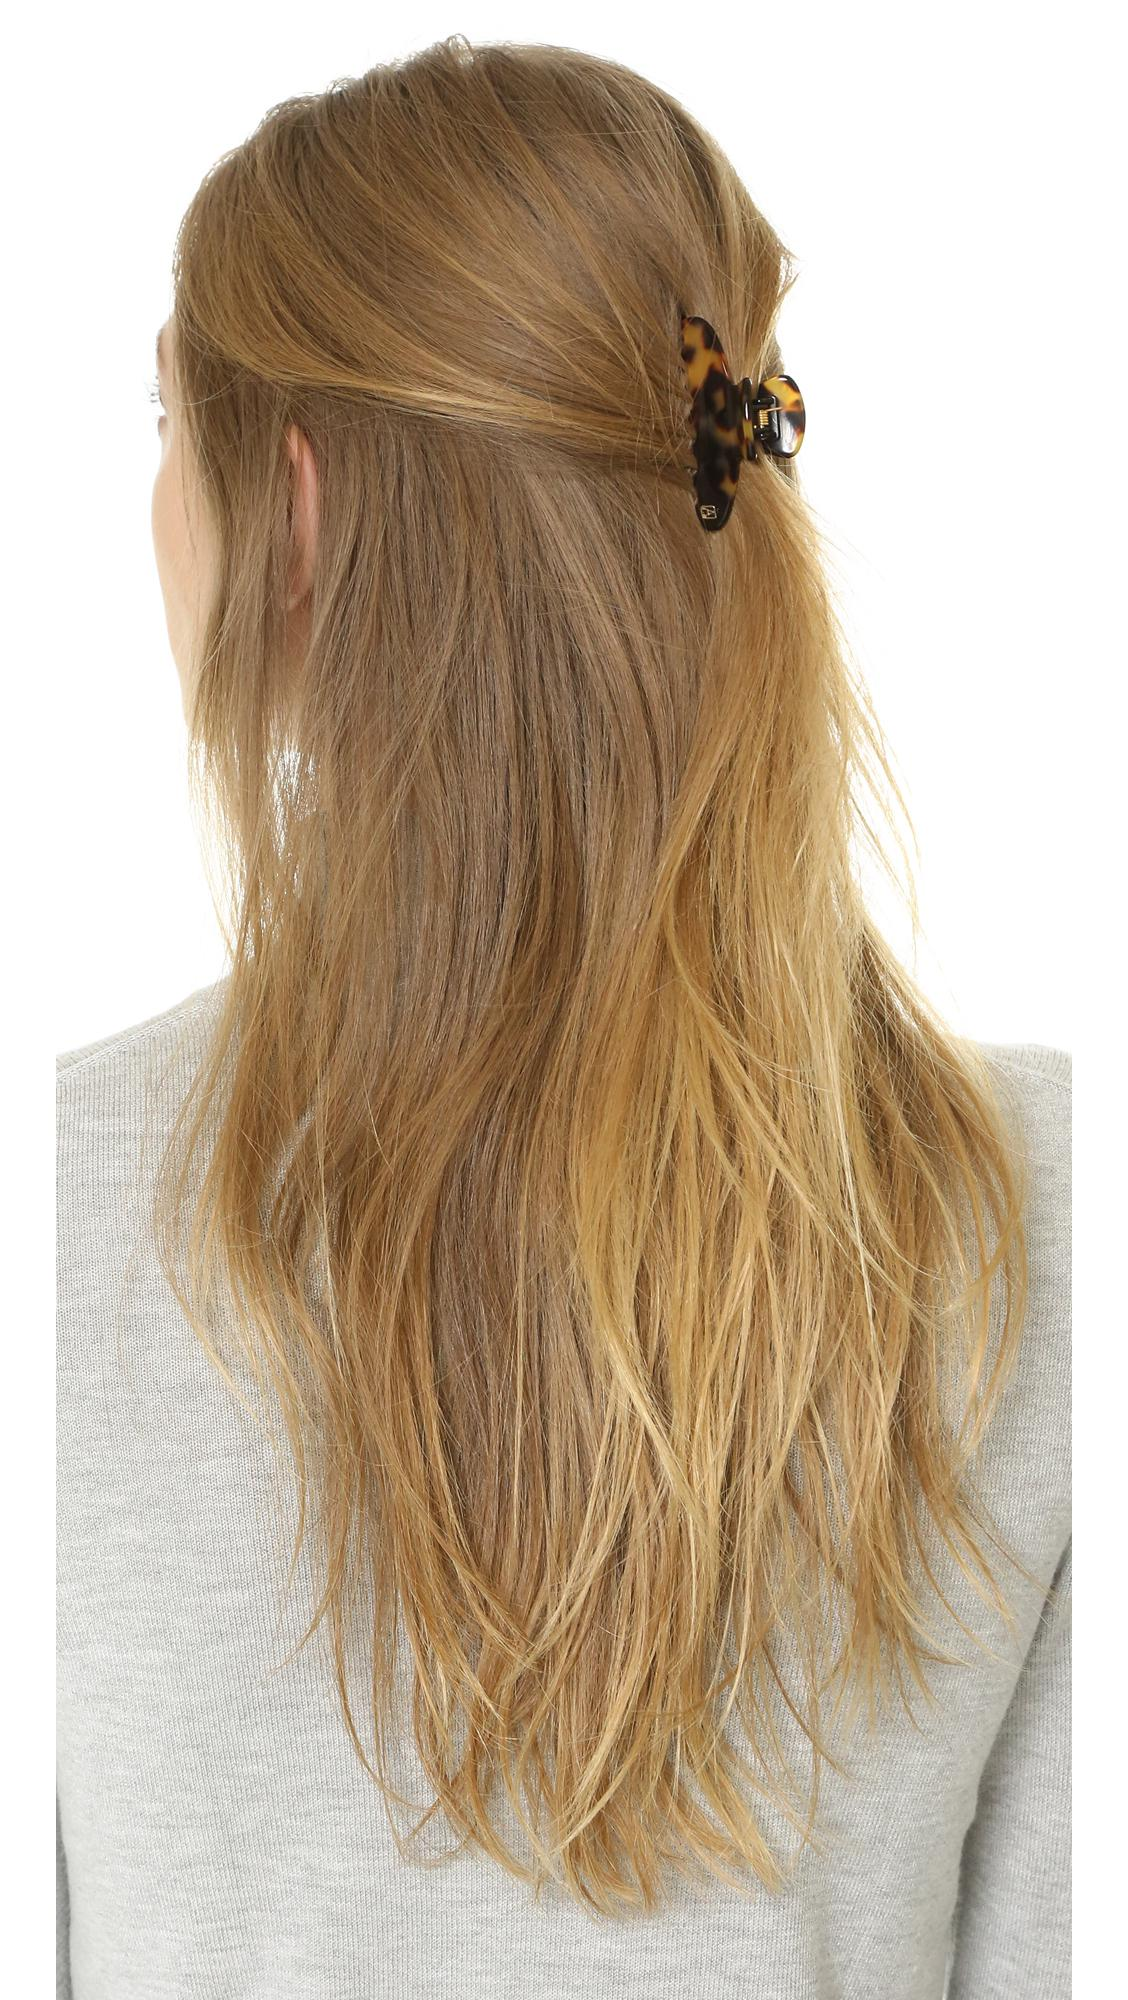 Alexandre de Paris Jaw Hair Clip 7jdfEwe